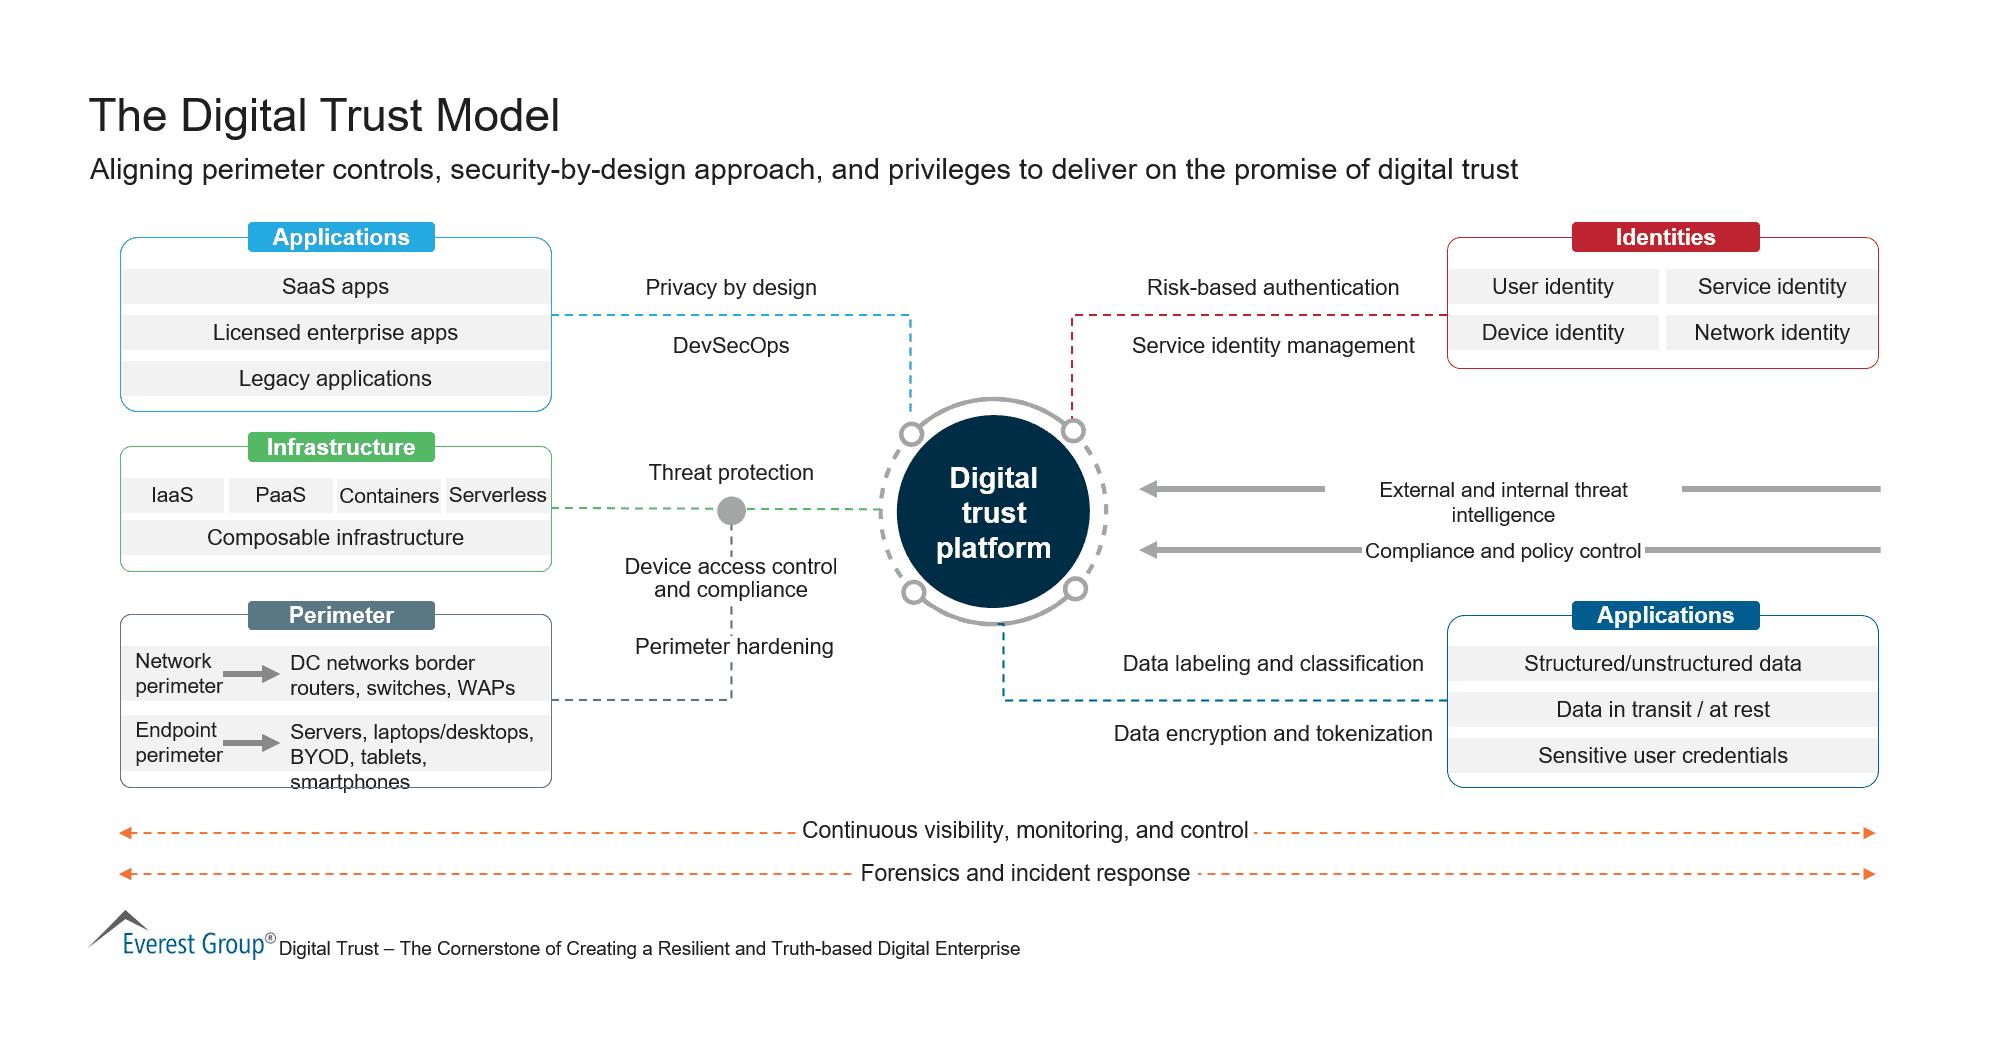 The Digital Trust Model